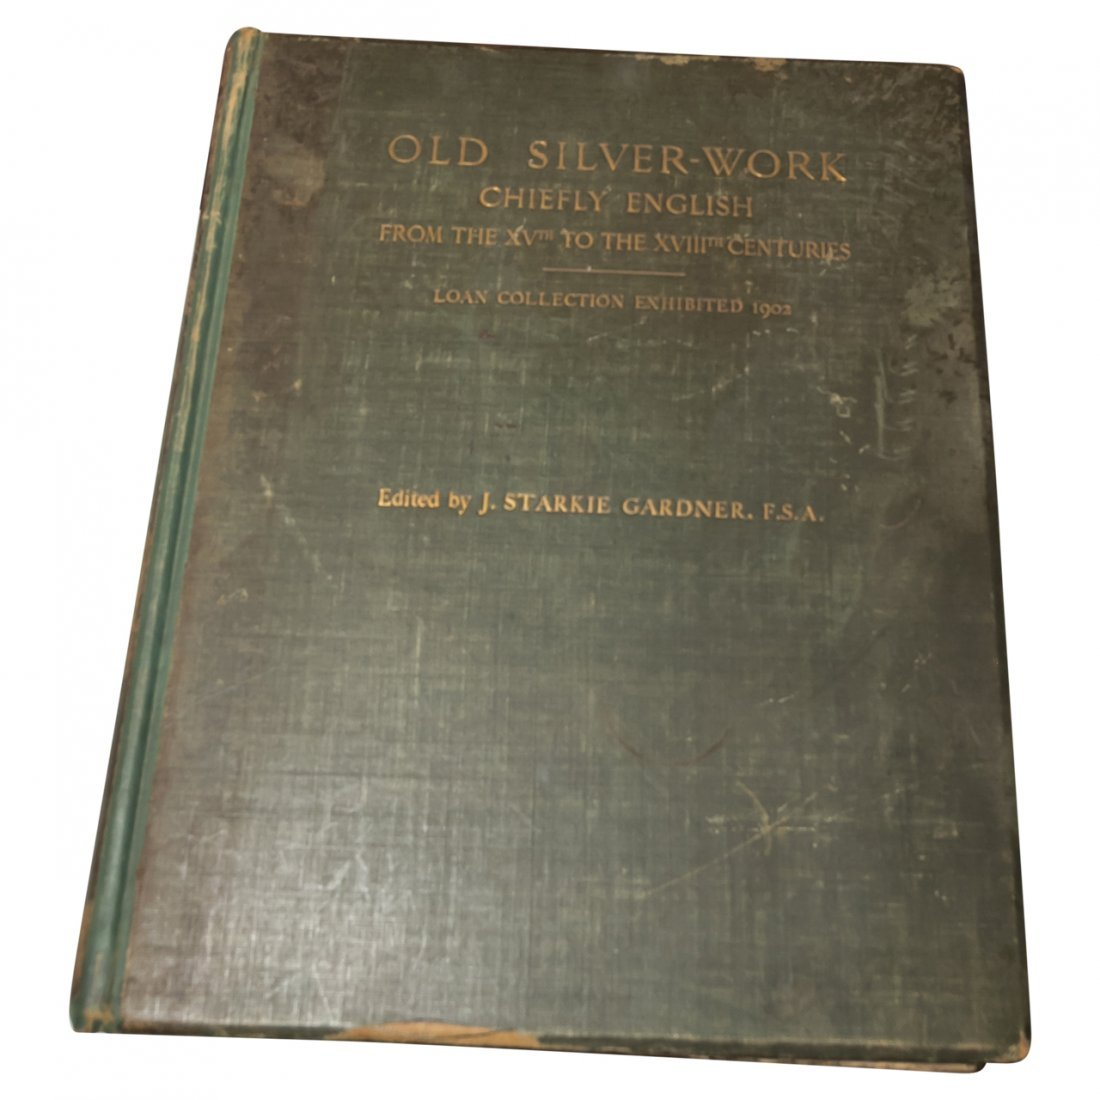 Old Silver Book by J. Starkie Gardner